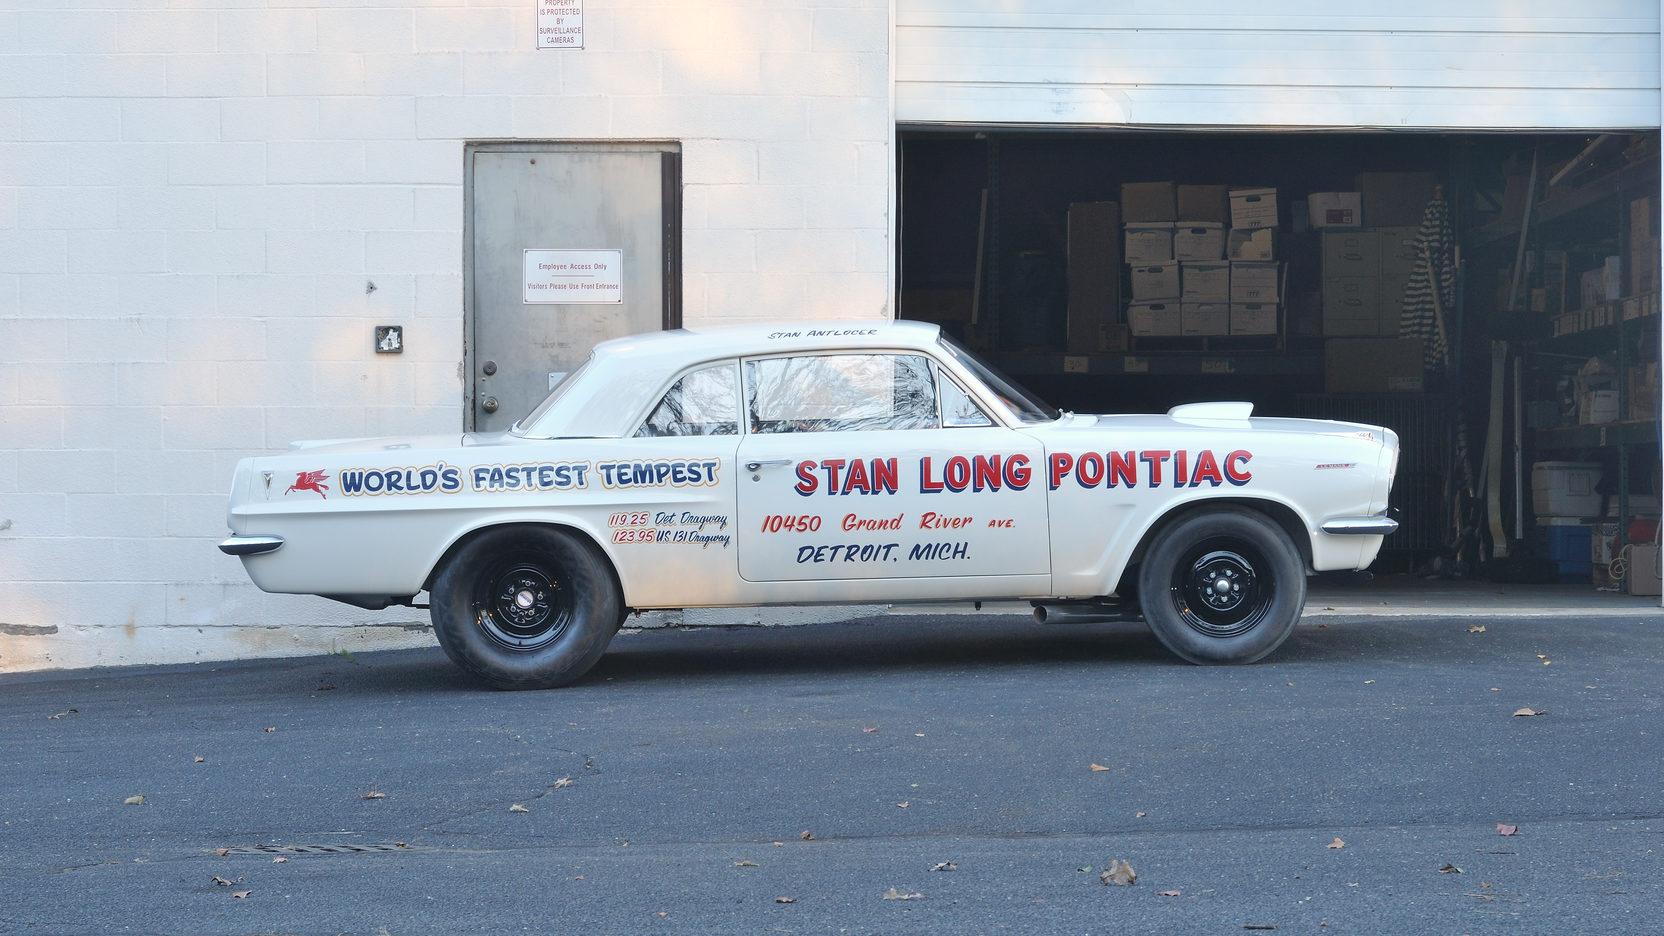 1963 Pontiac Tempest Super Duty side profile